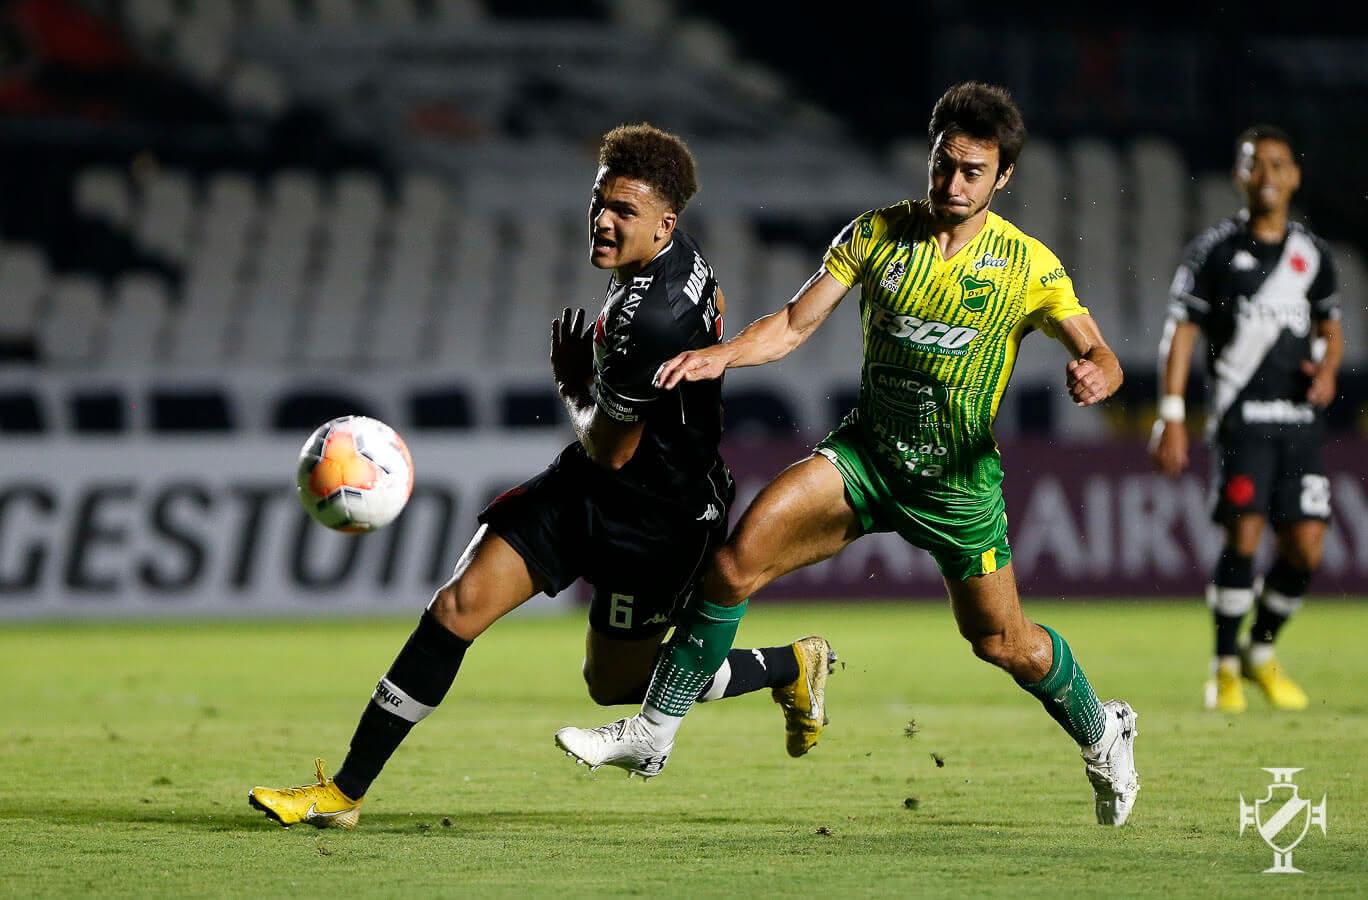 Neto Borges durante o jogo contra o Defensa y Justicia